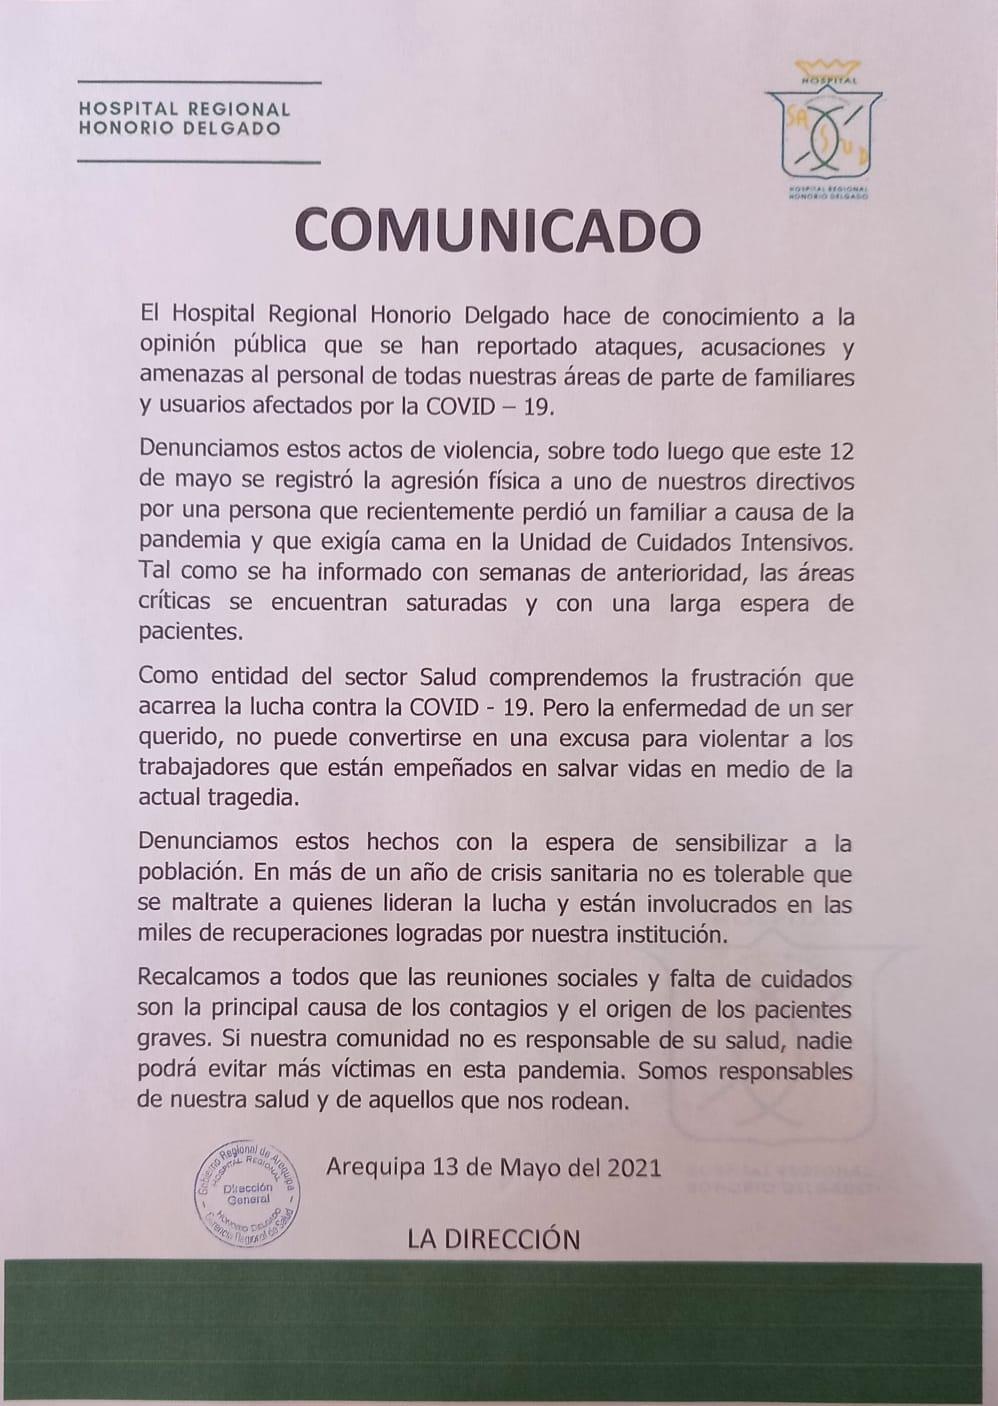 Comunicado de hospital para pacientes covid-19 en Arequipa.